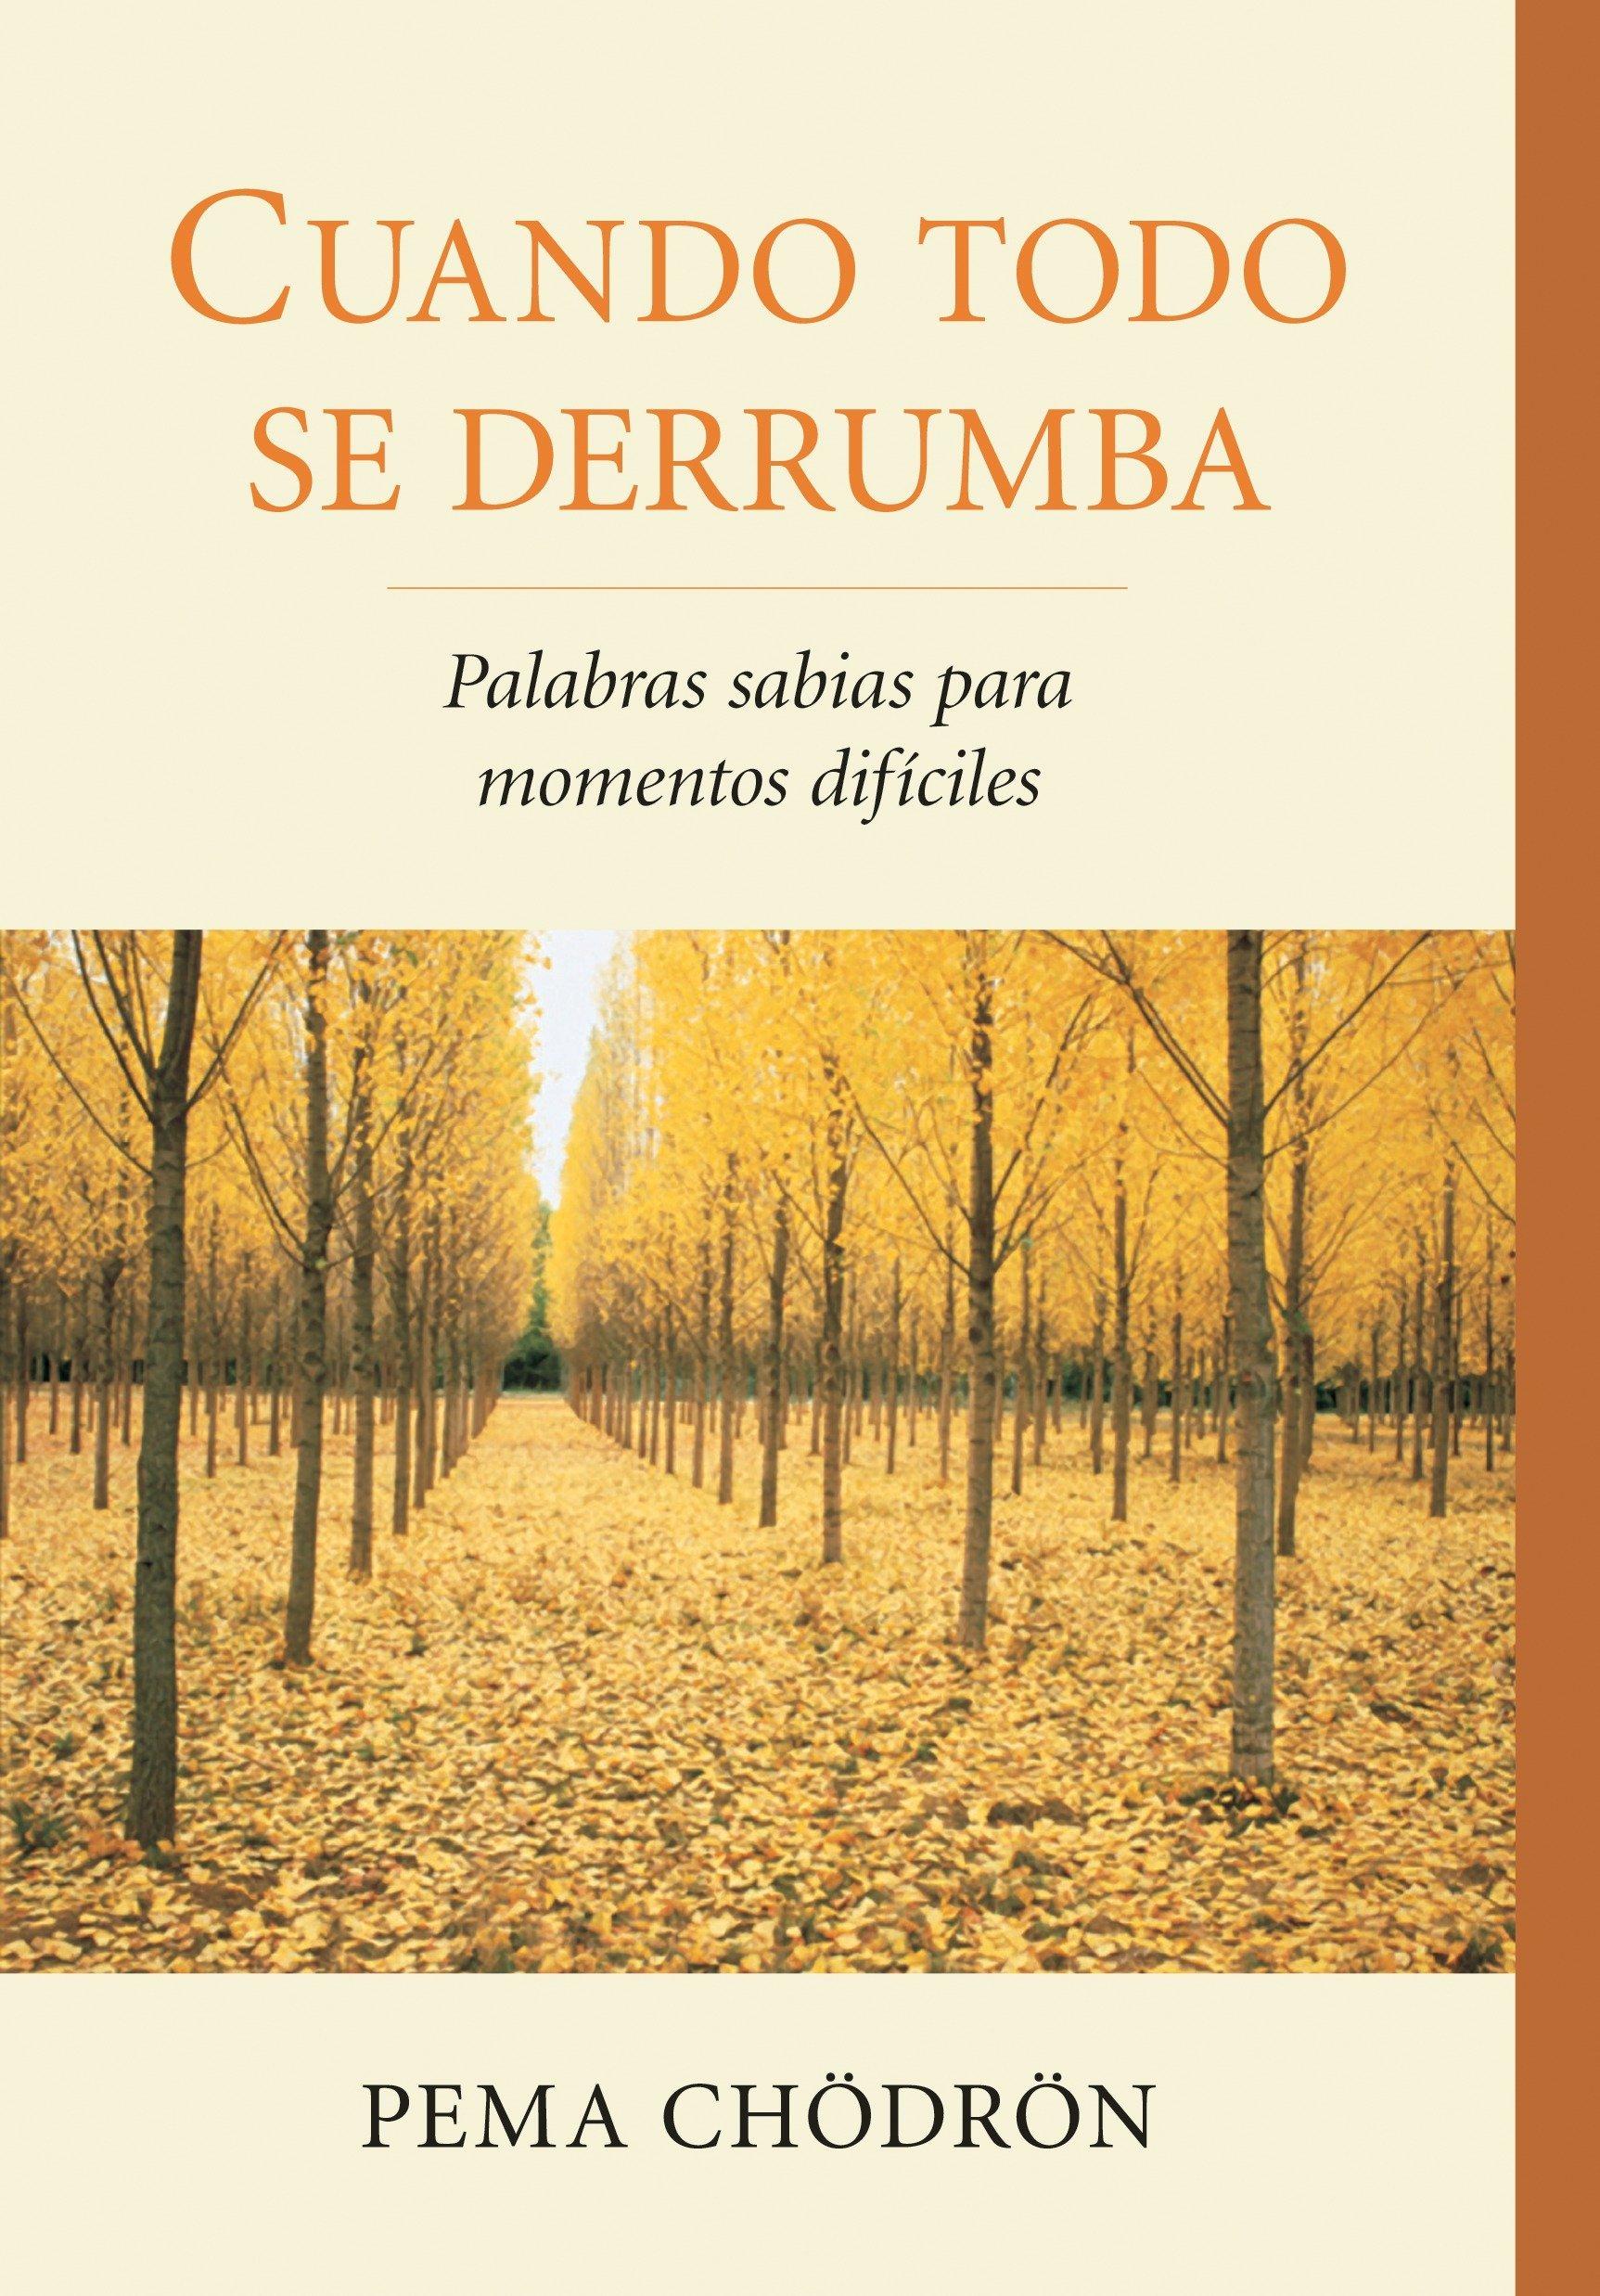 Read Online Cuando todo se derrumba (When Things Fall Apart): Palabras sabias para momentos dificiles (Spanish Edition) pdf epub